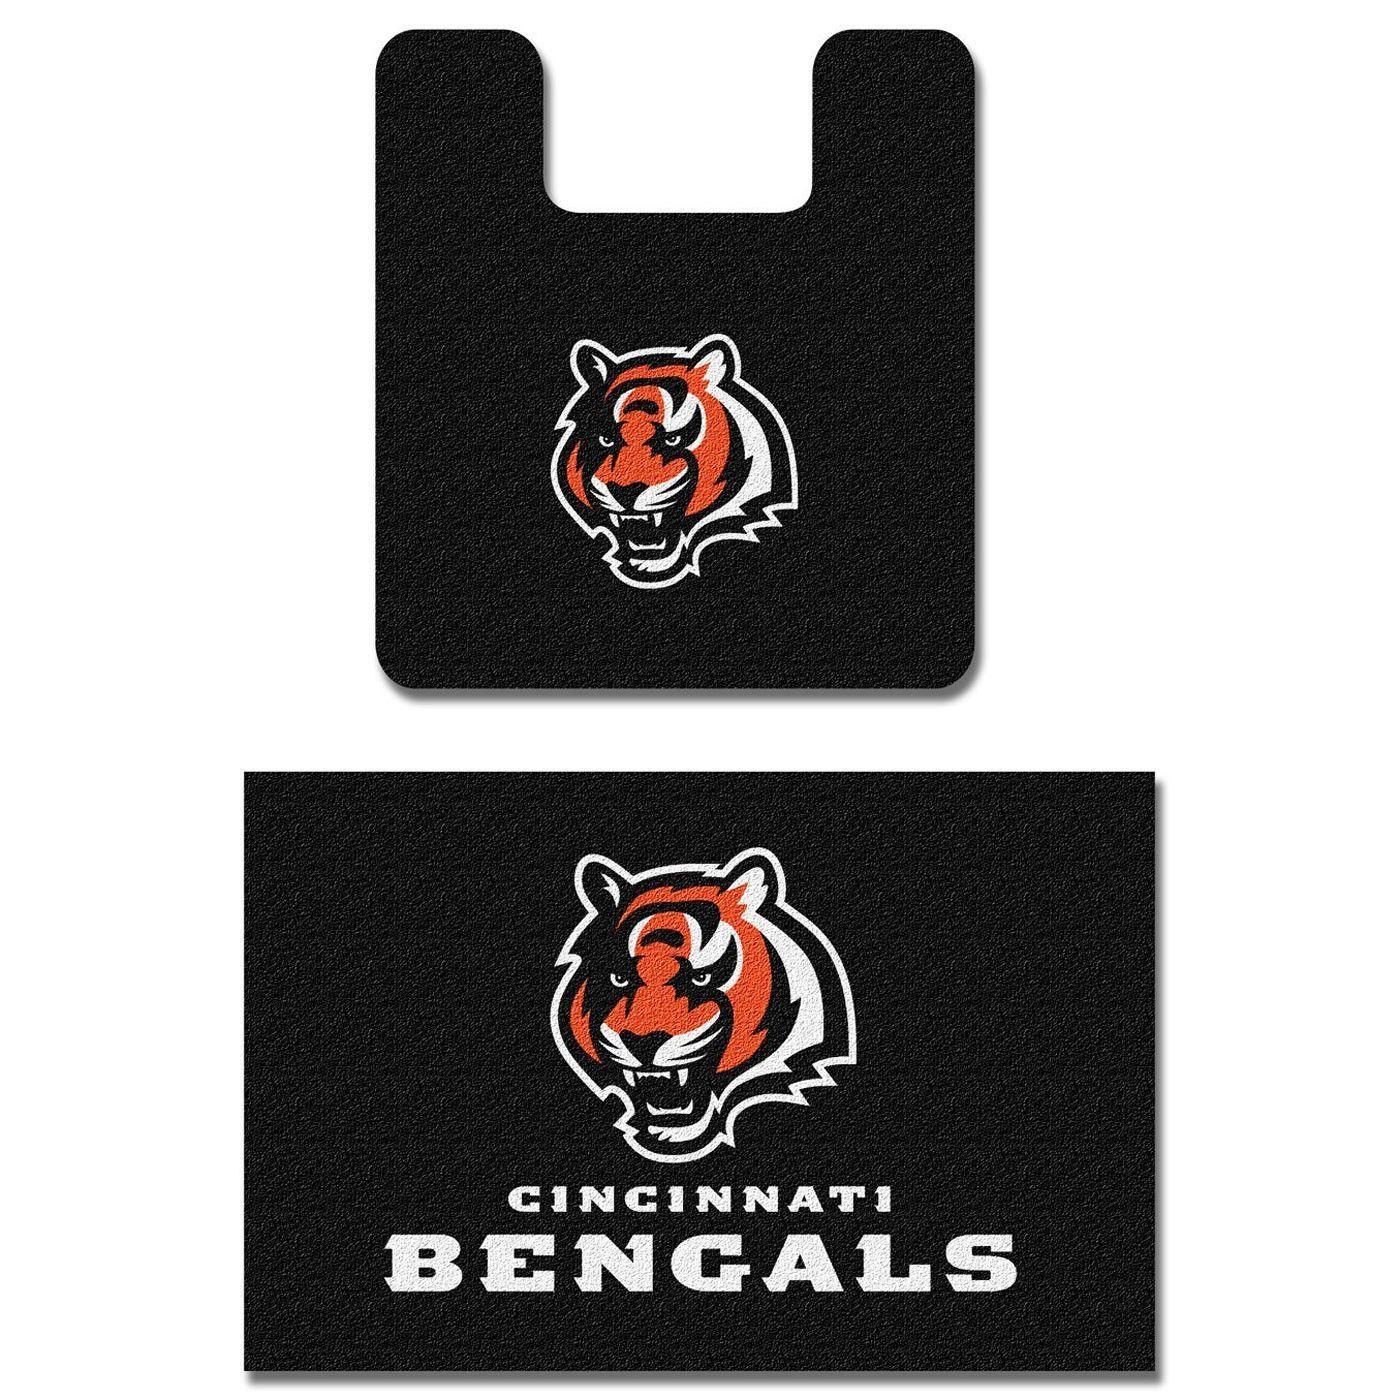 NFL Cincinnati Bengals Bath Mat Set Football Bathroom Rugs Brody - Orange bath mat set for bathroom decorating ideas